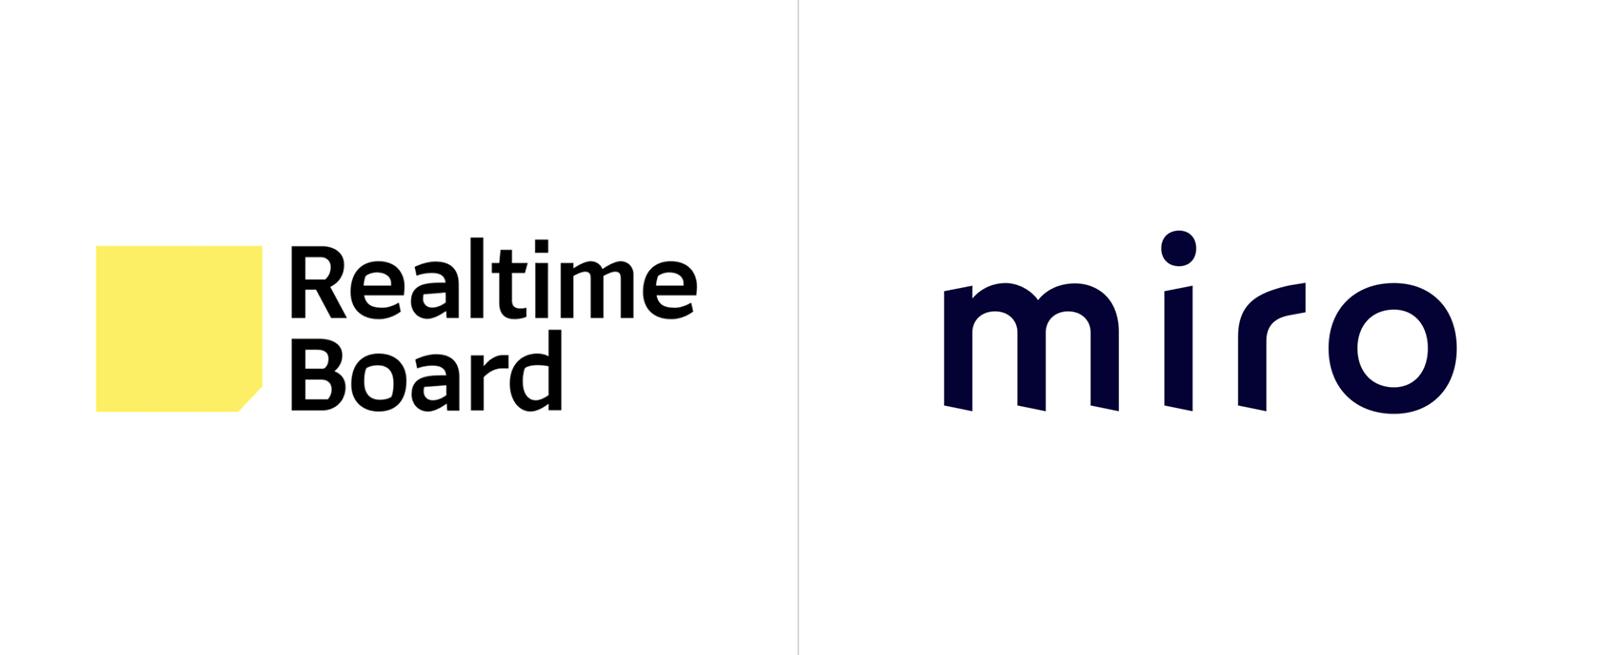 RealtimeBoard更名miro并启用全新的品牌logo和vi形象设计-深圳vi设计